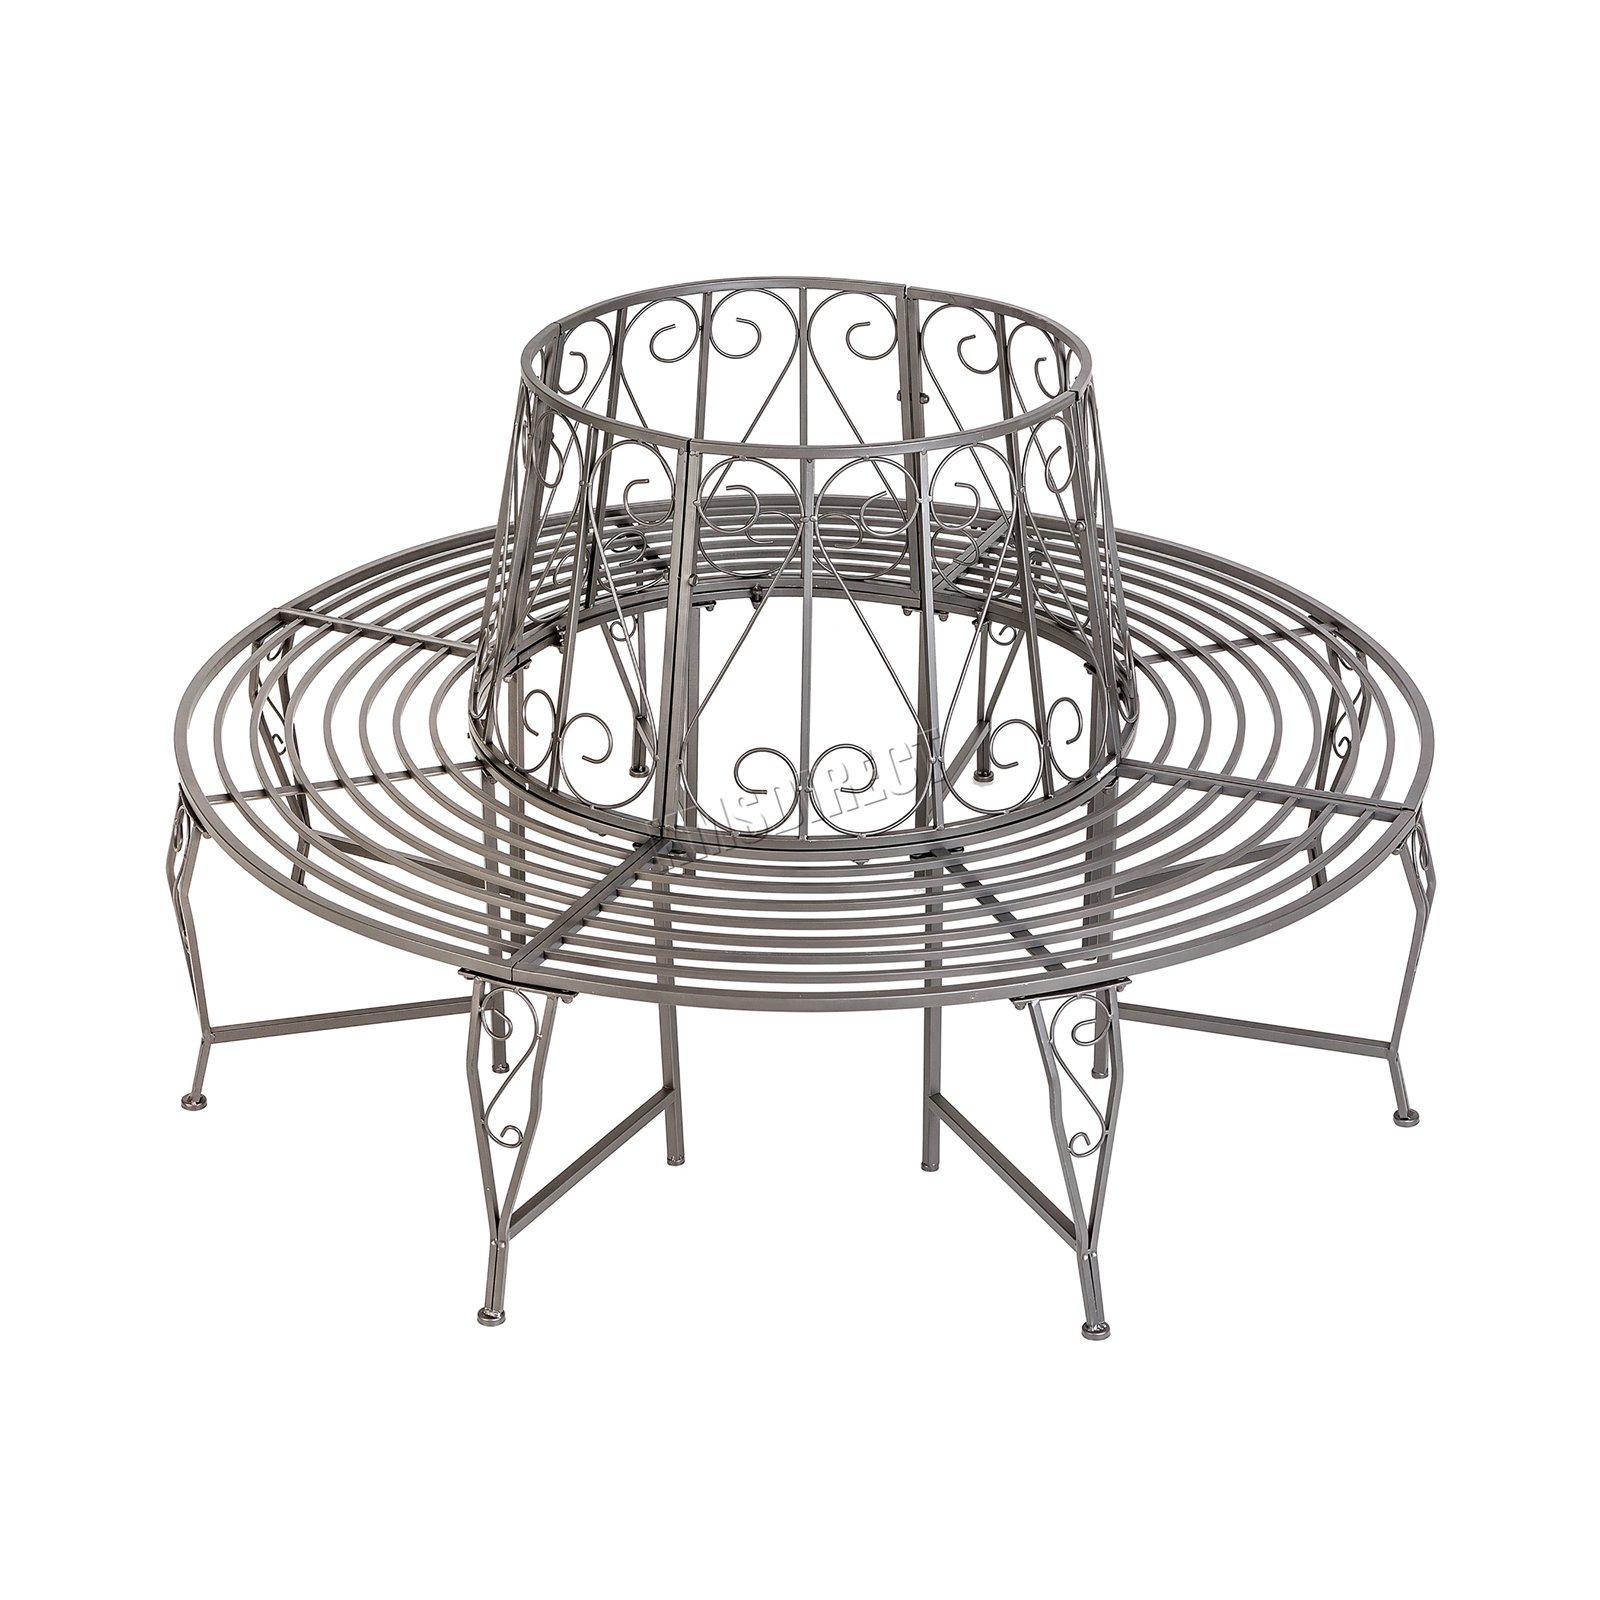 Westwood Outdoor Garden Tree Bench Round Circular Steel